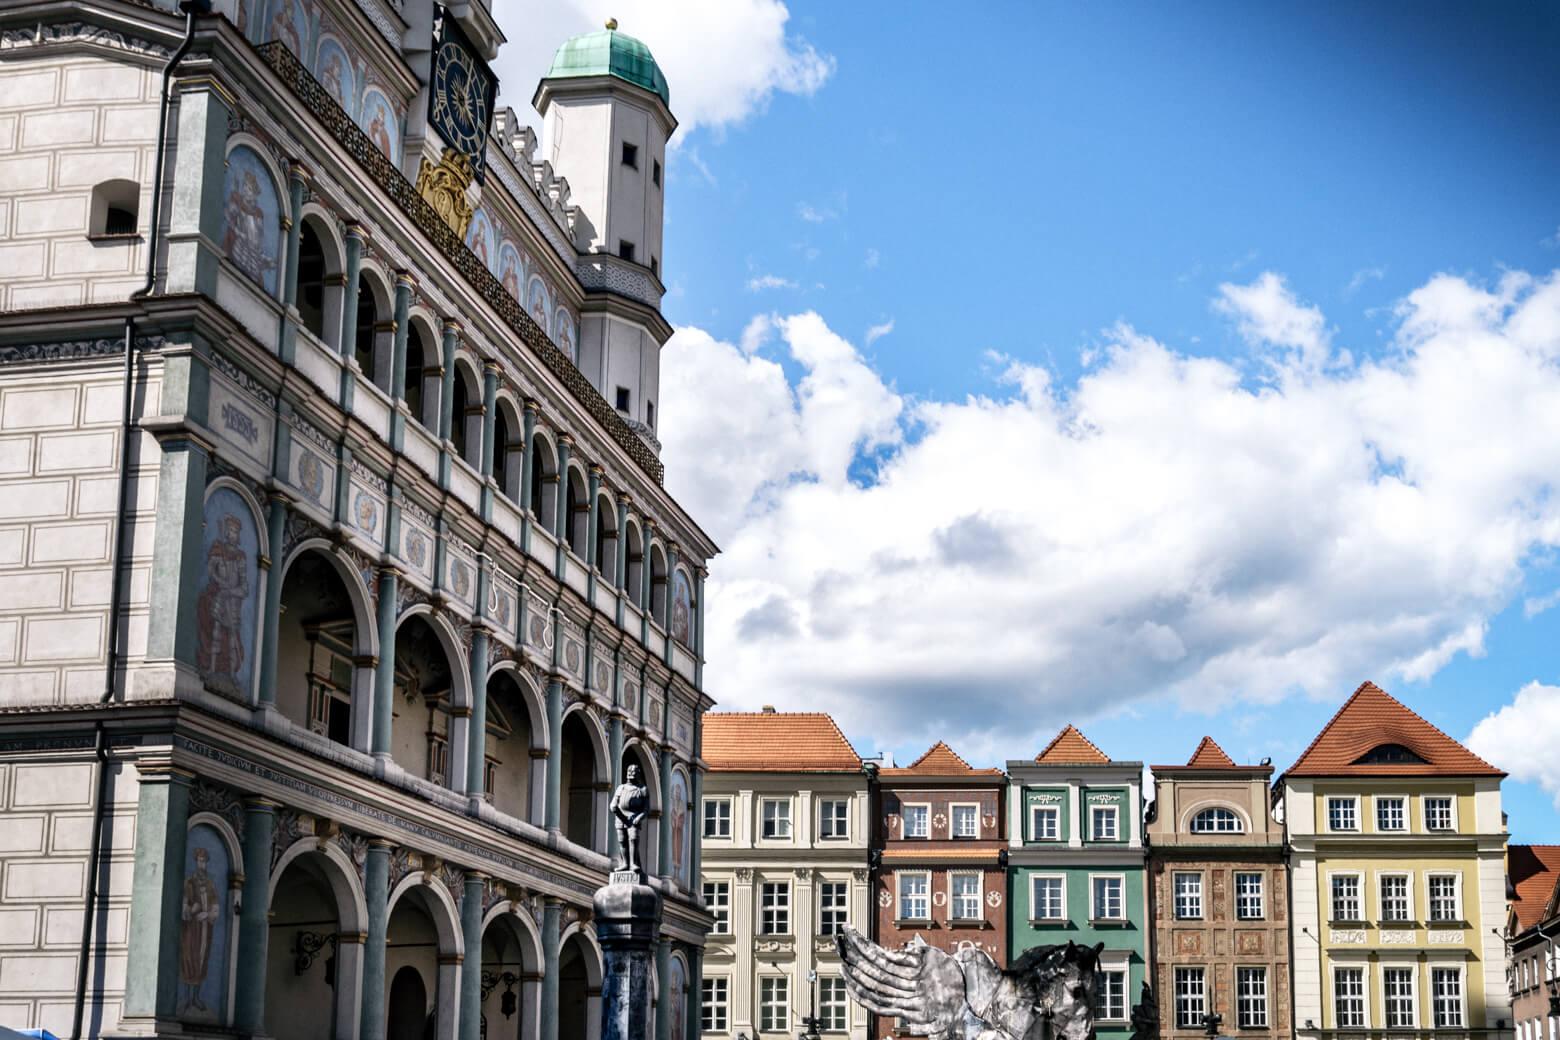 Poznan Renaissance Town Hall